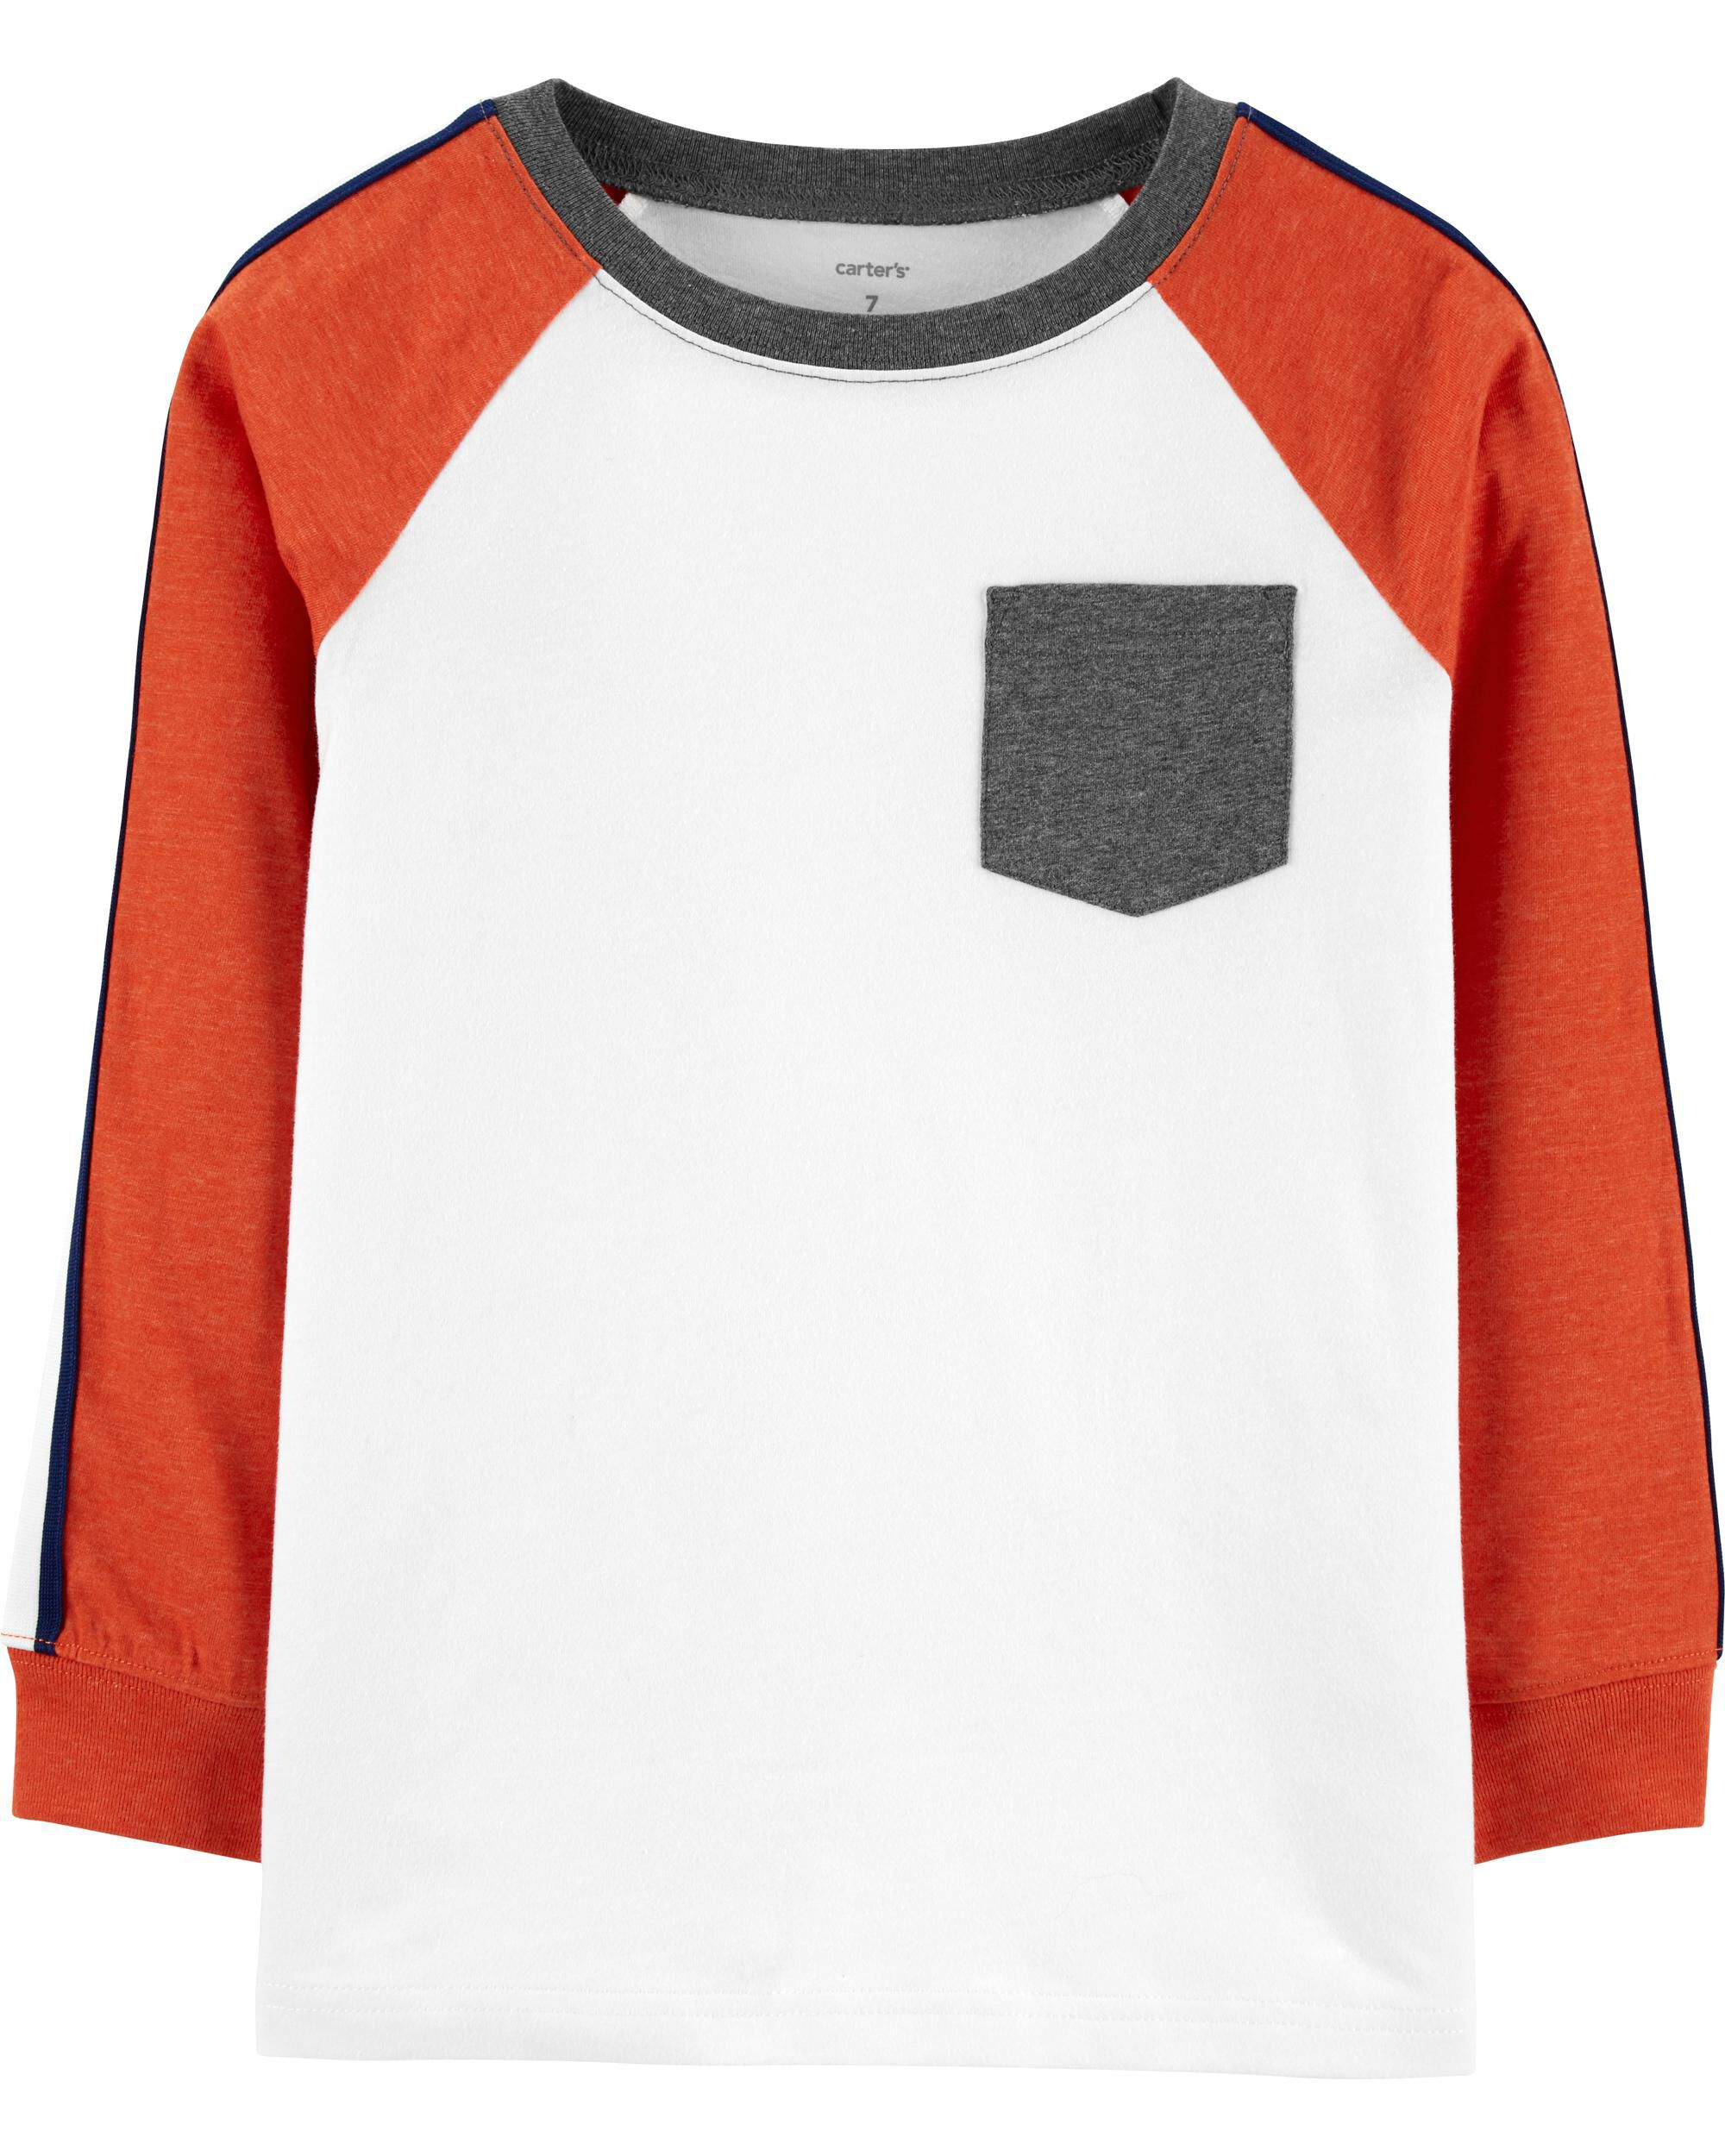 New Oshkosh Boys Active Football Action Shirt Top 5,6,7,8,10,12,14